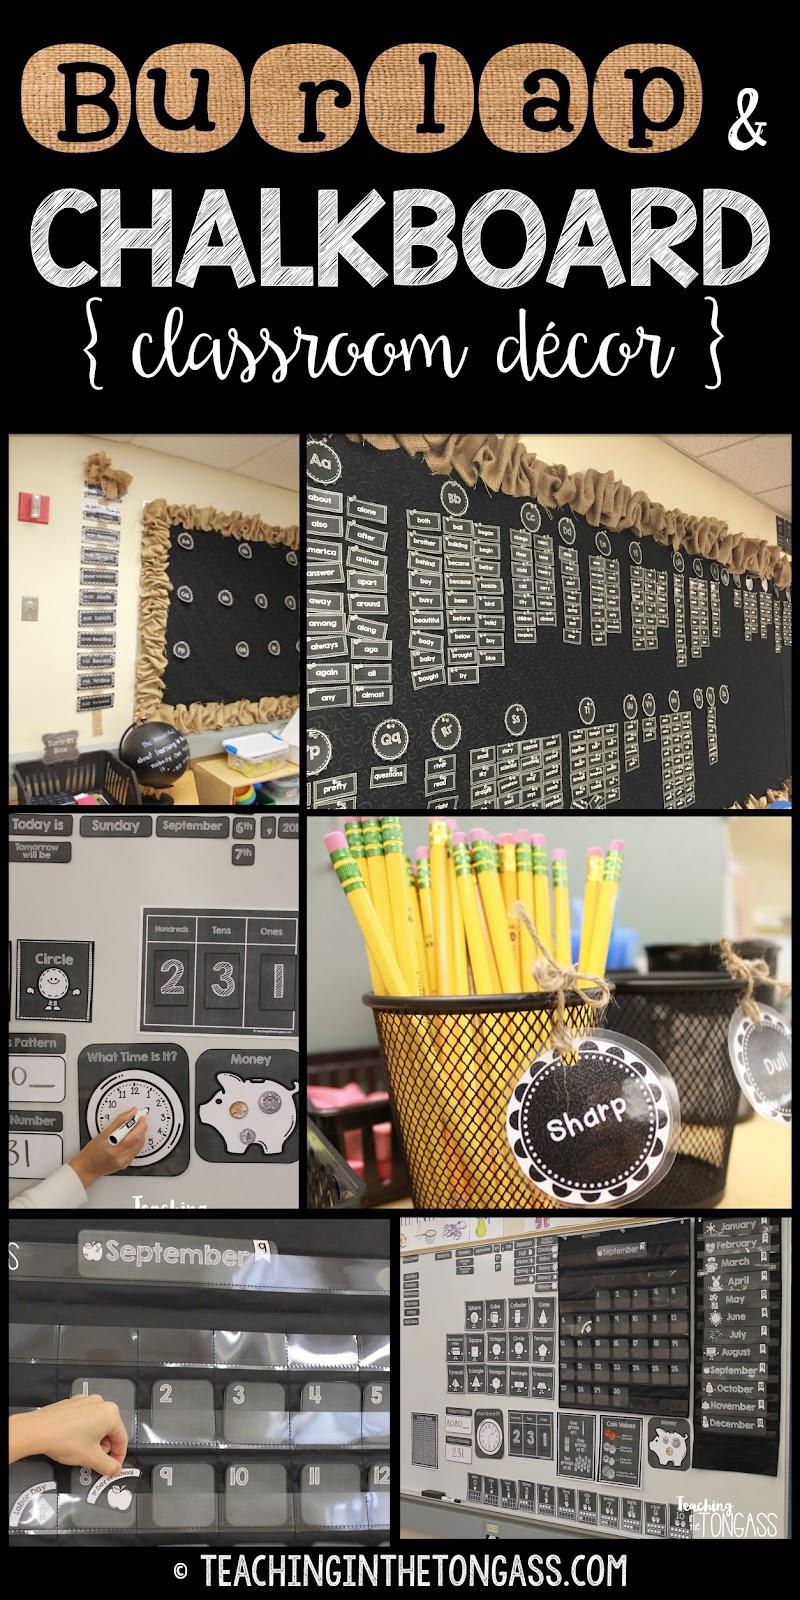 Teacher Classroom Decor Websites ~ Burlap and chalkboard bulletin board classroom decor